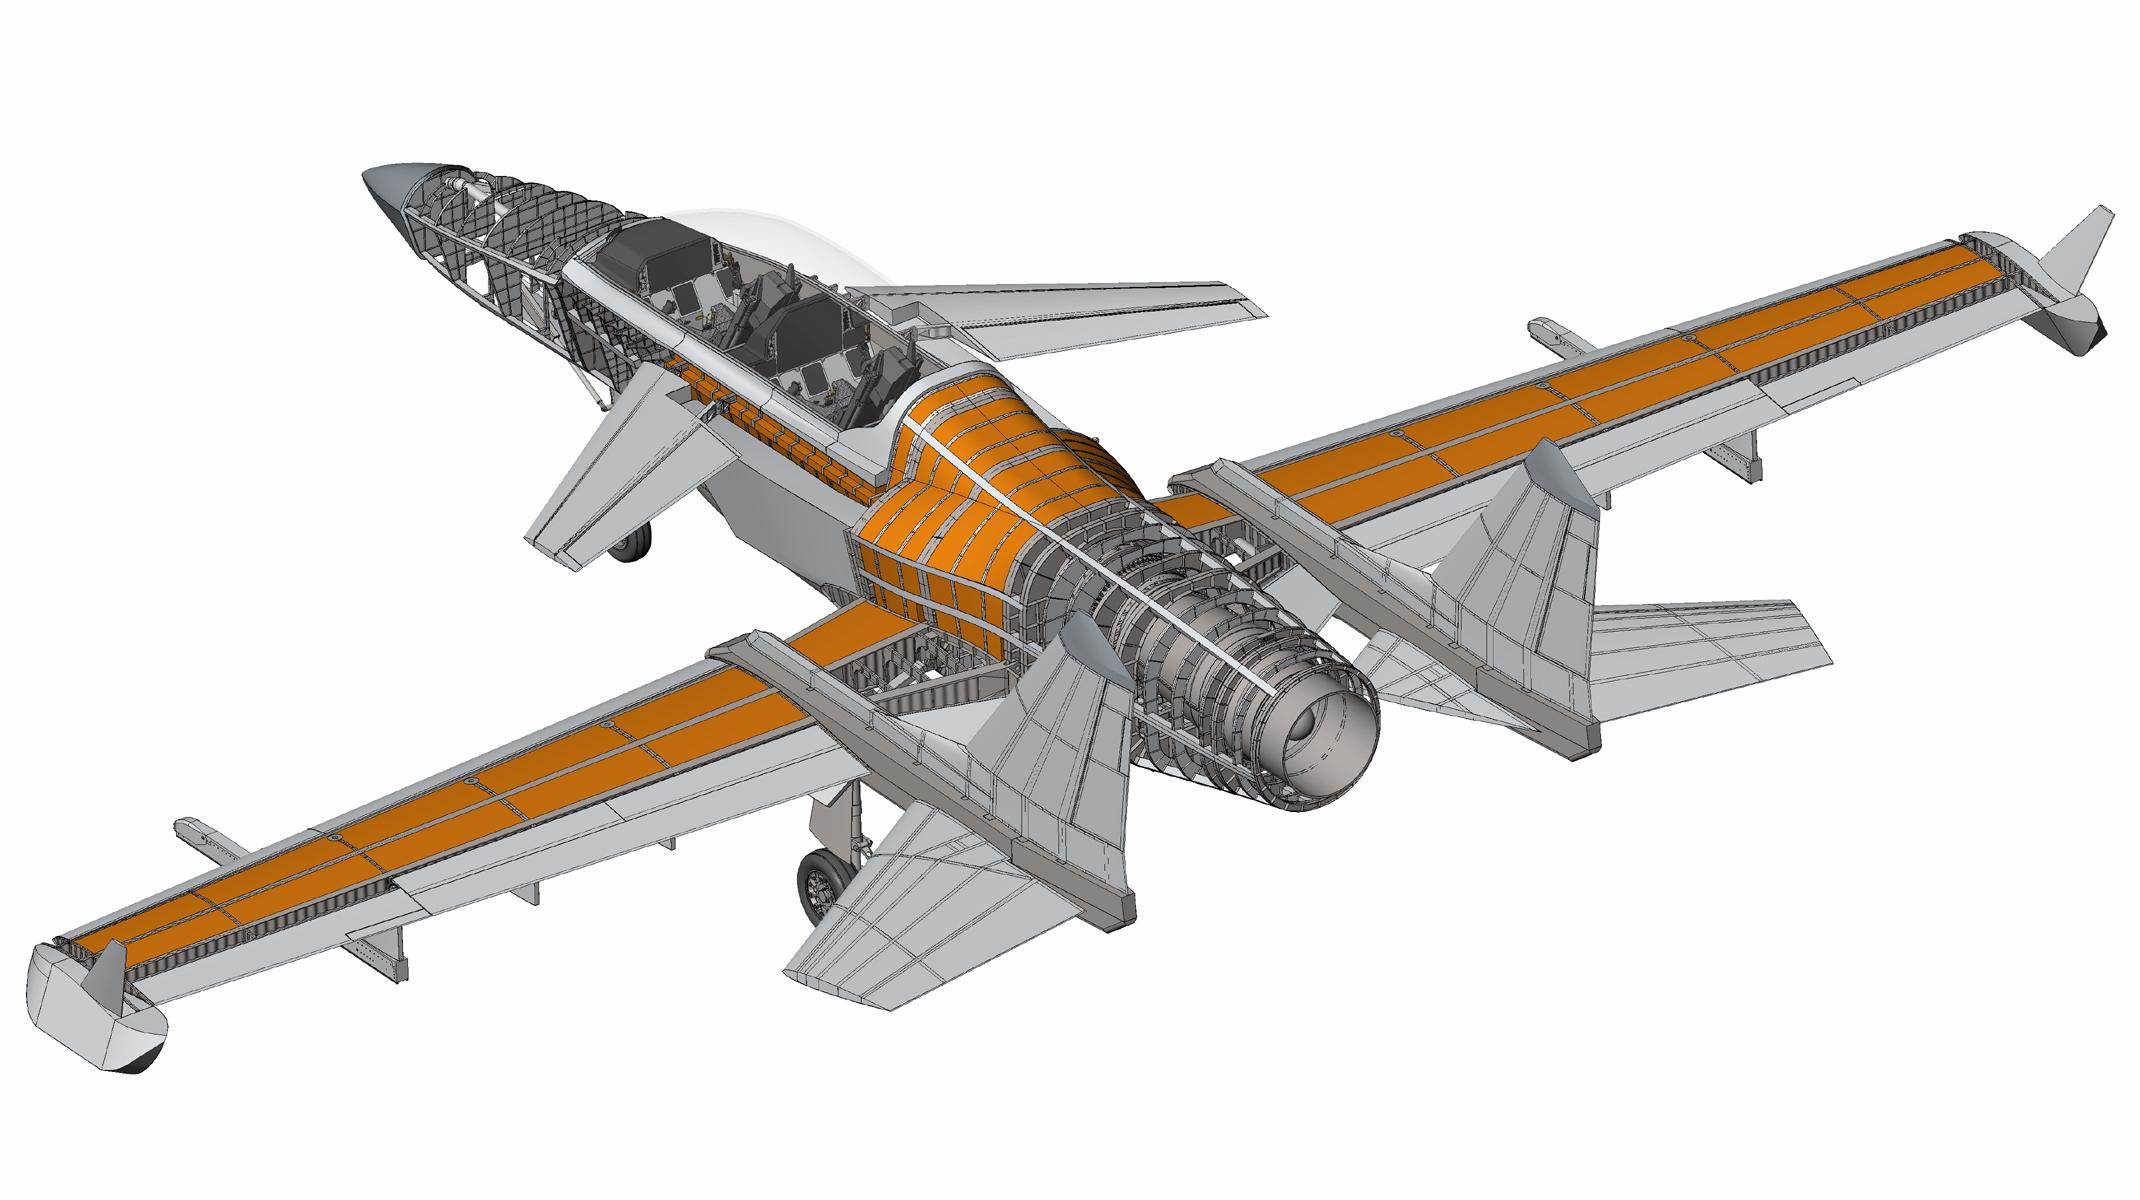 Stavatti, SM-28, Machete, CAS, Close Air Support